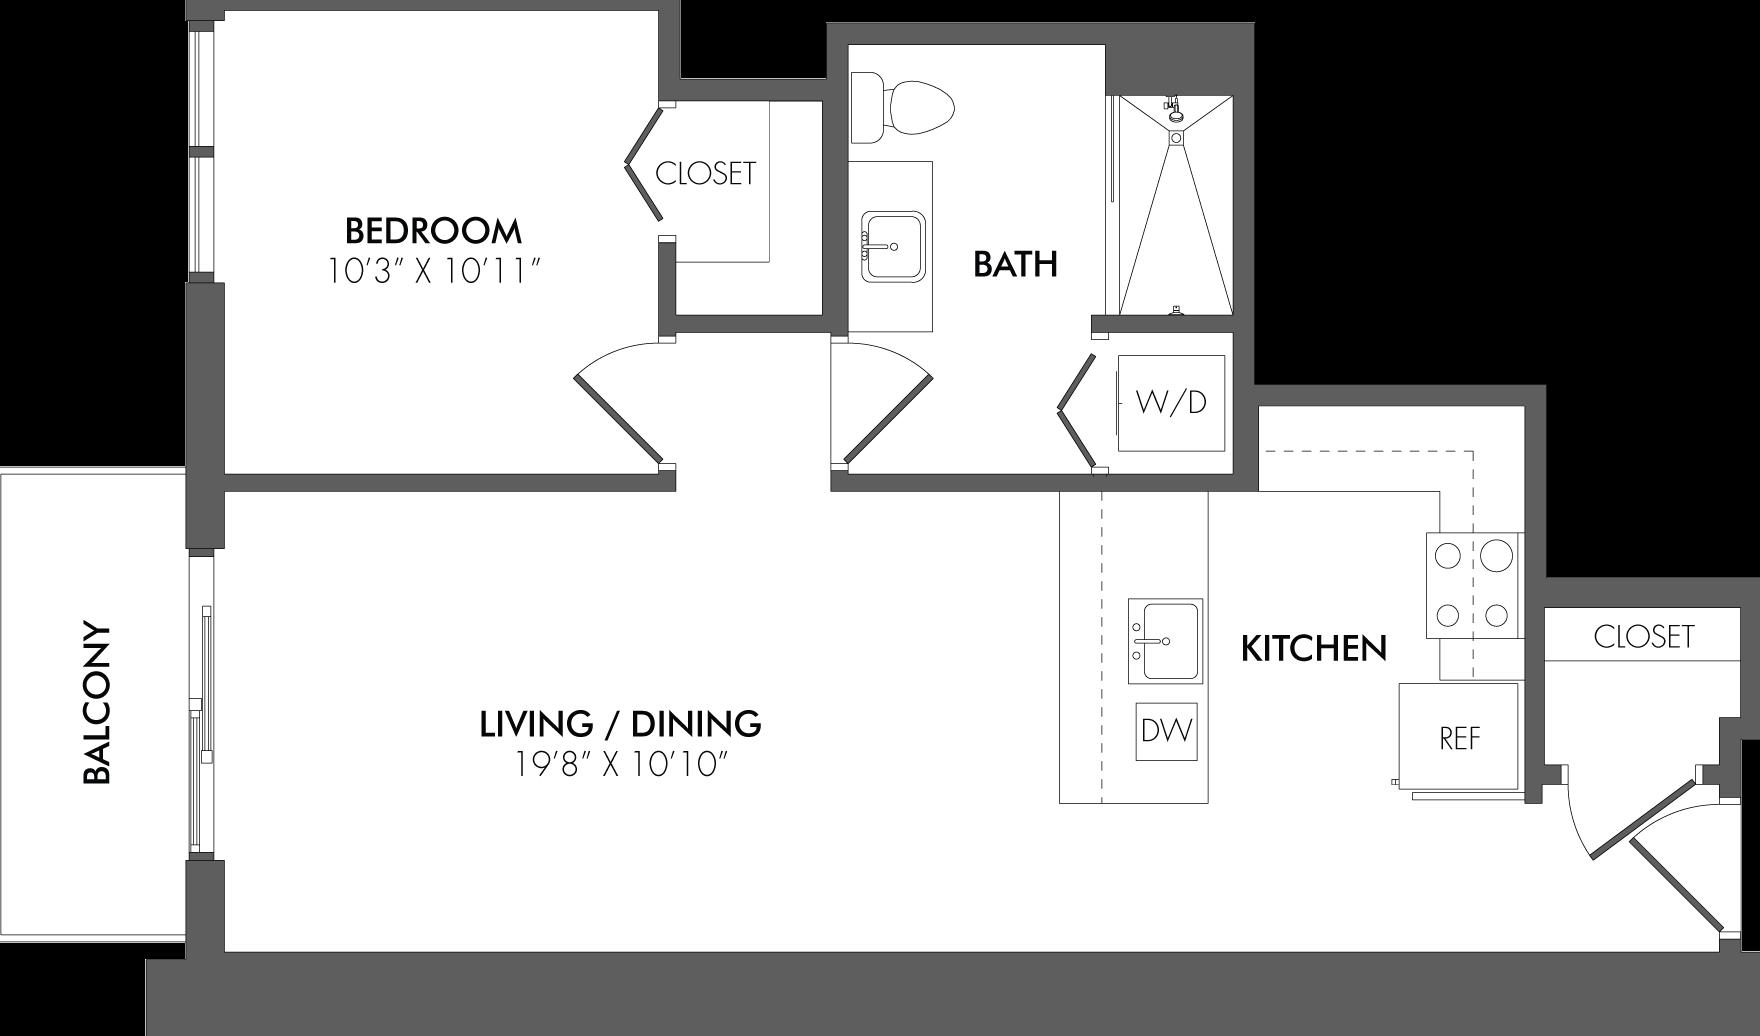 Apartment 2412 floorplan